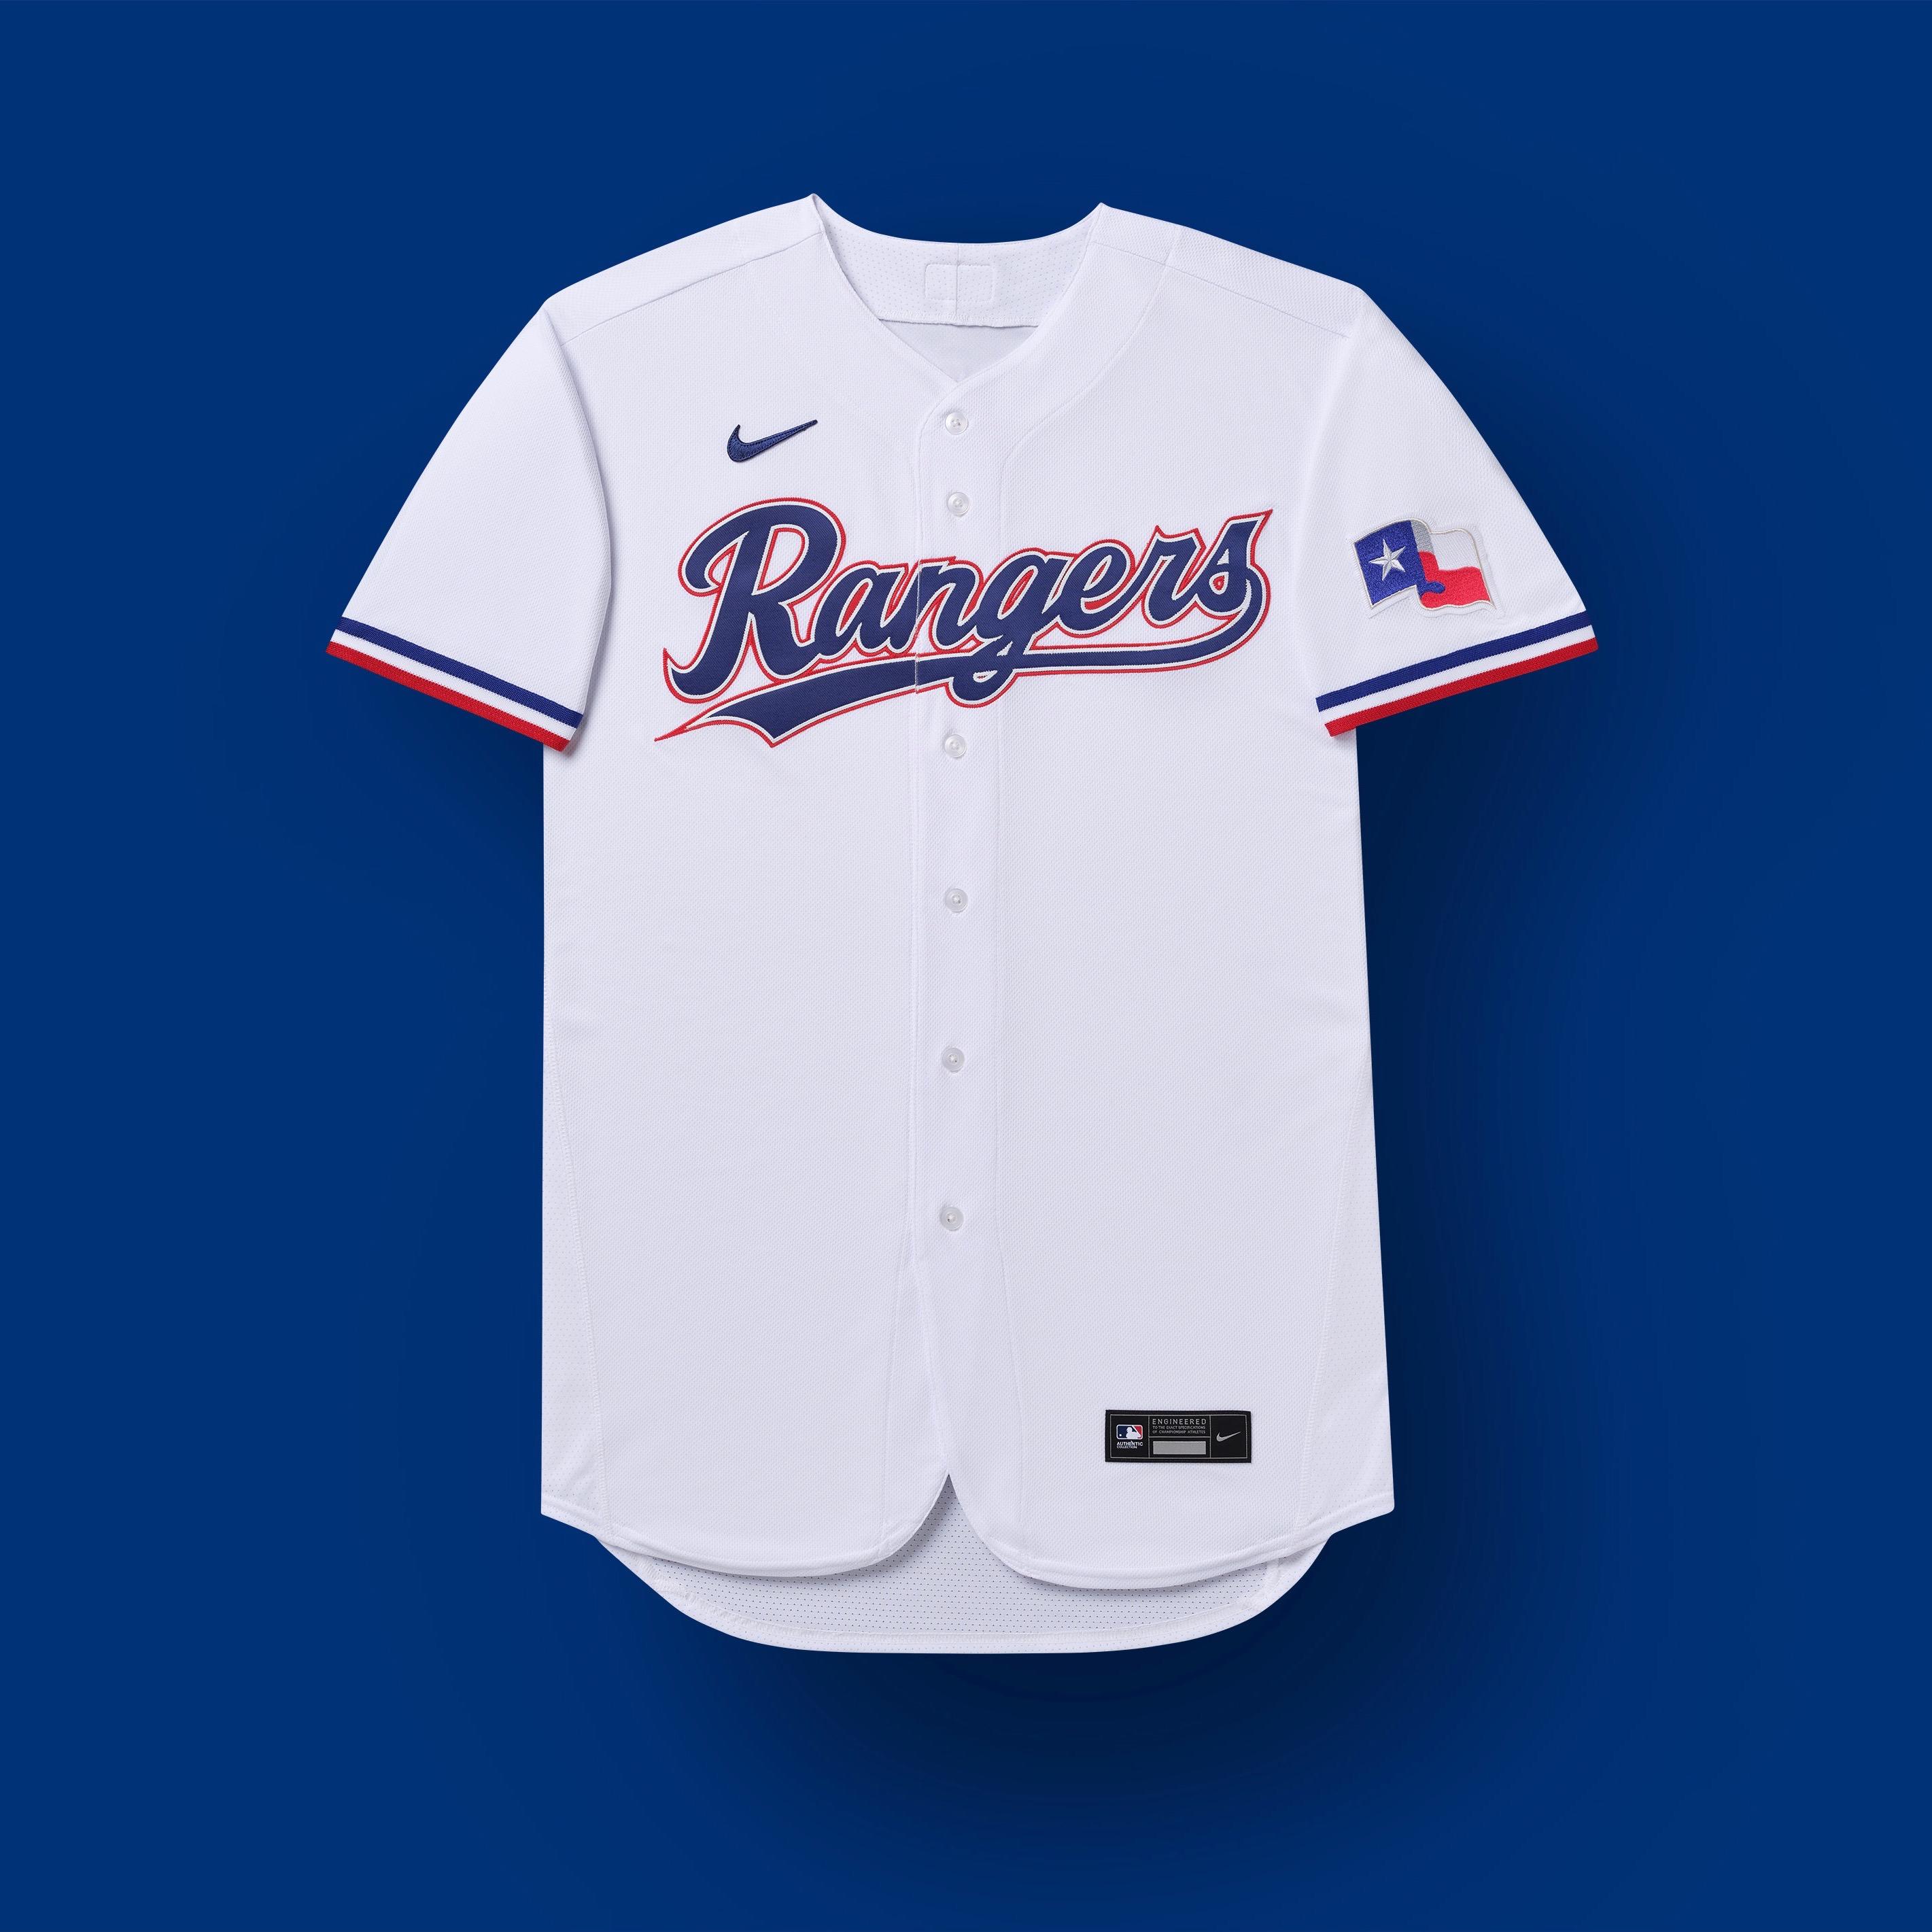 texas rangers 2020 uniforms